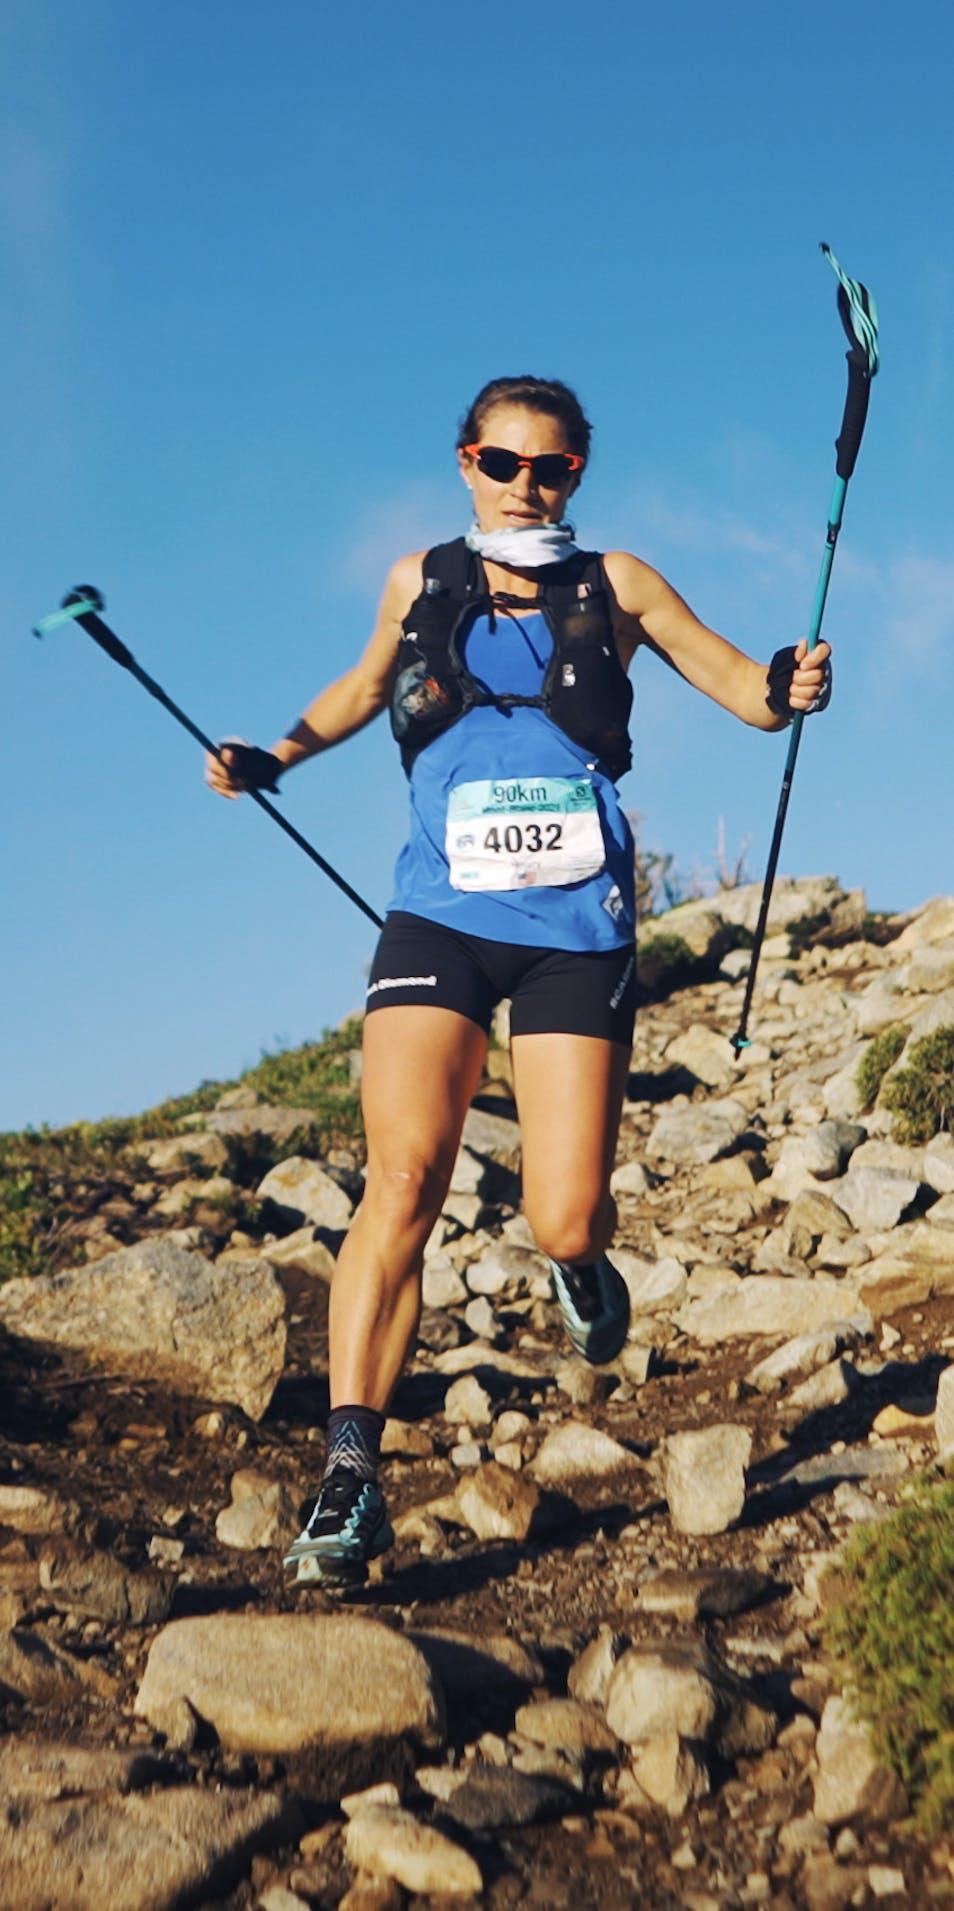 Black Diamond athlete Hillary Gerardi at the Mont Blanc finish